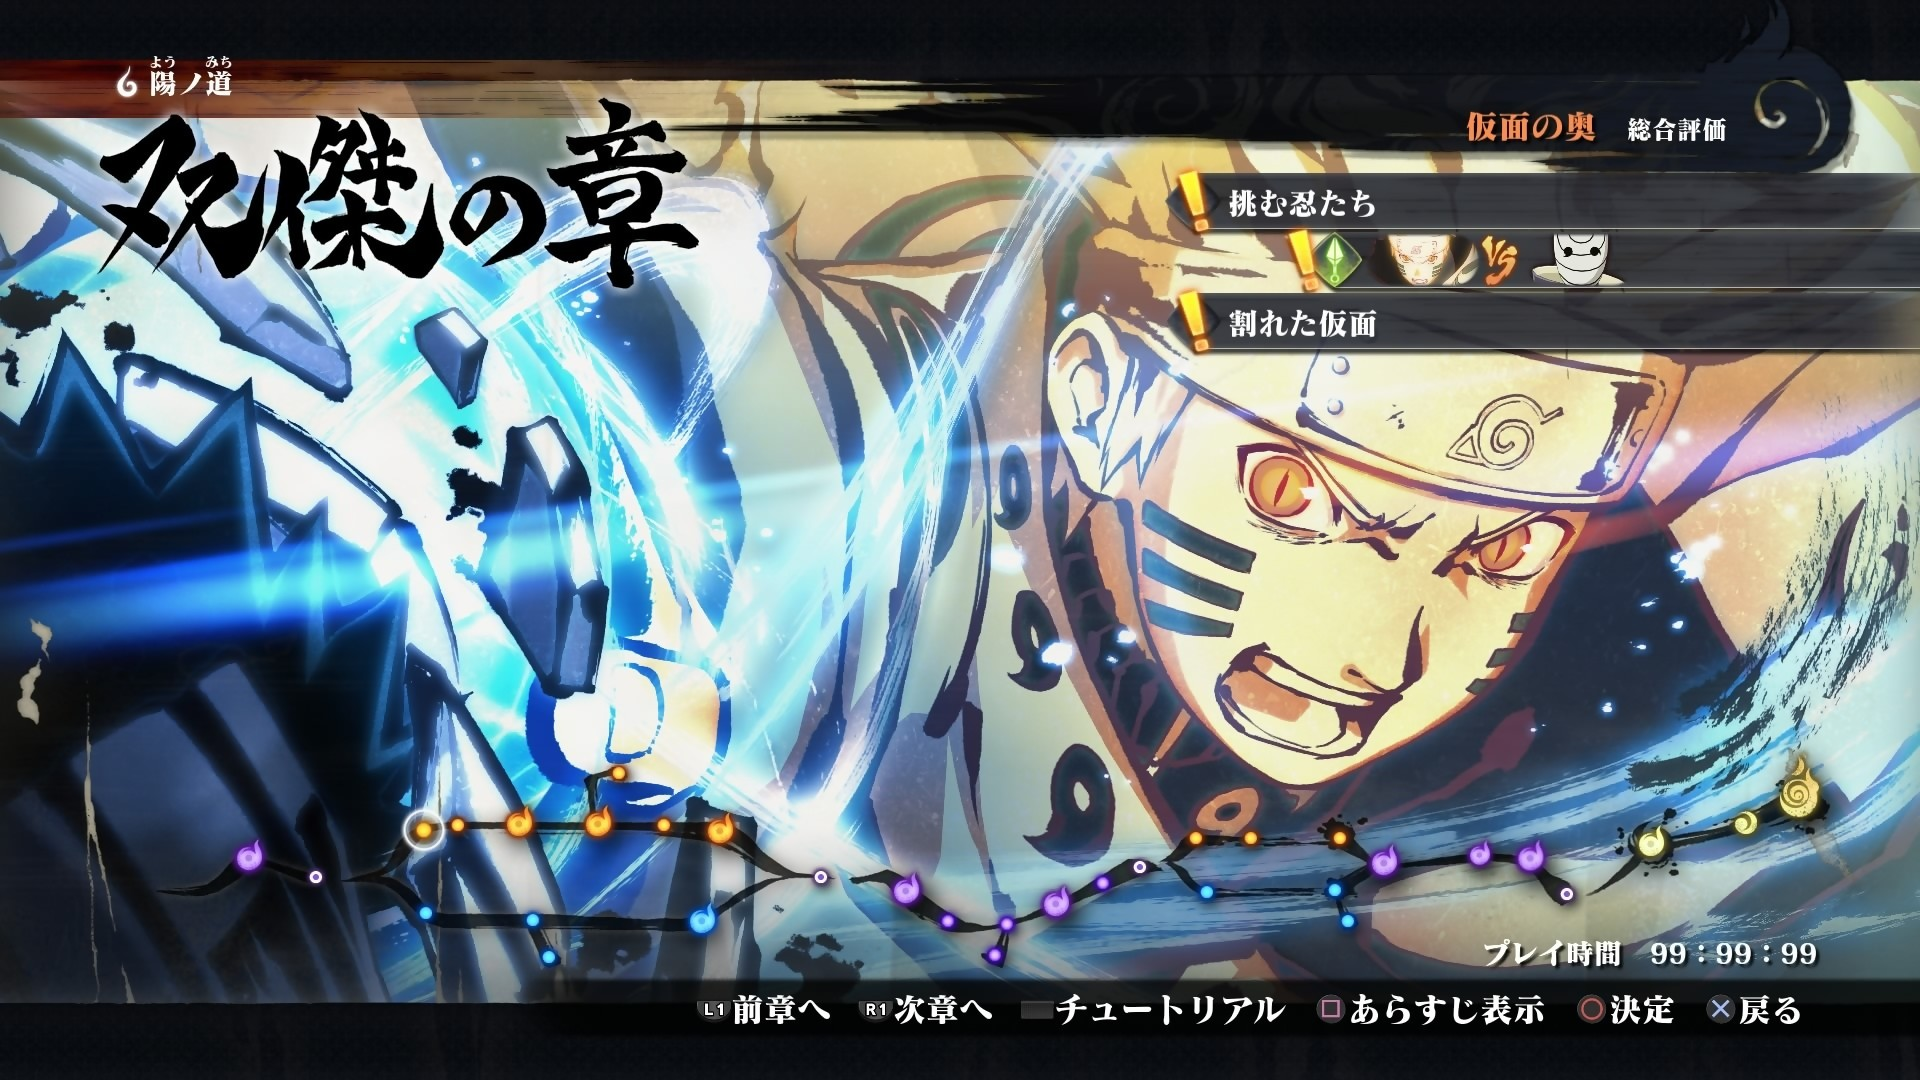 Sen Nin Mode Naruto Fond D Ecran Respmebrethest Cf